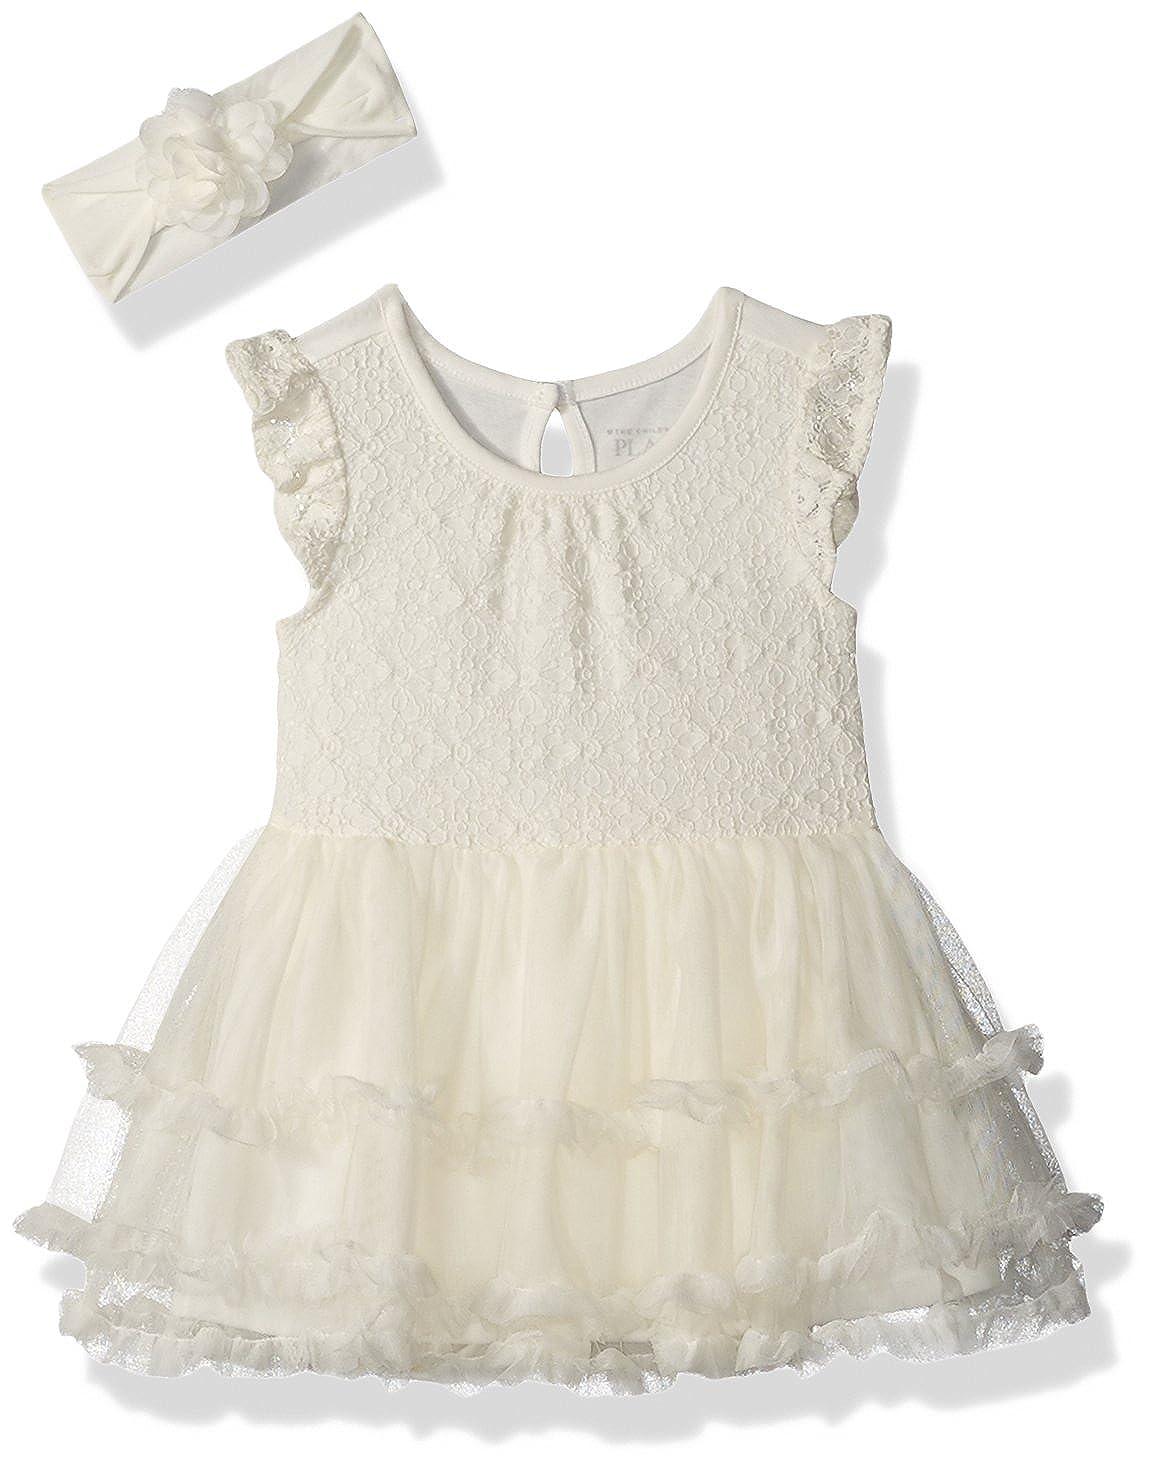 edaa7526d Amazon.com: The Children's Place Baby Girls' Flutter Sleeve Dressy Dresses:  Clothing